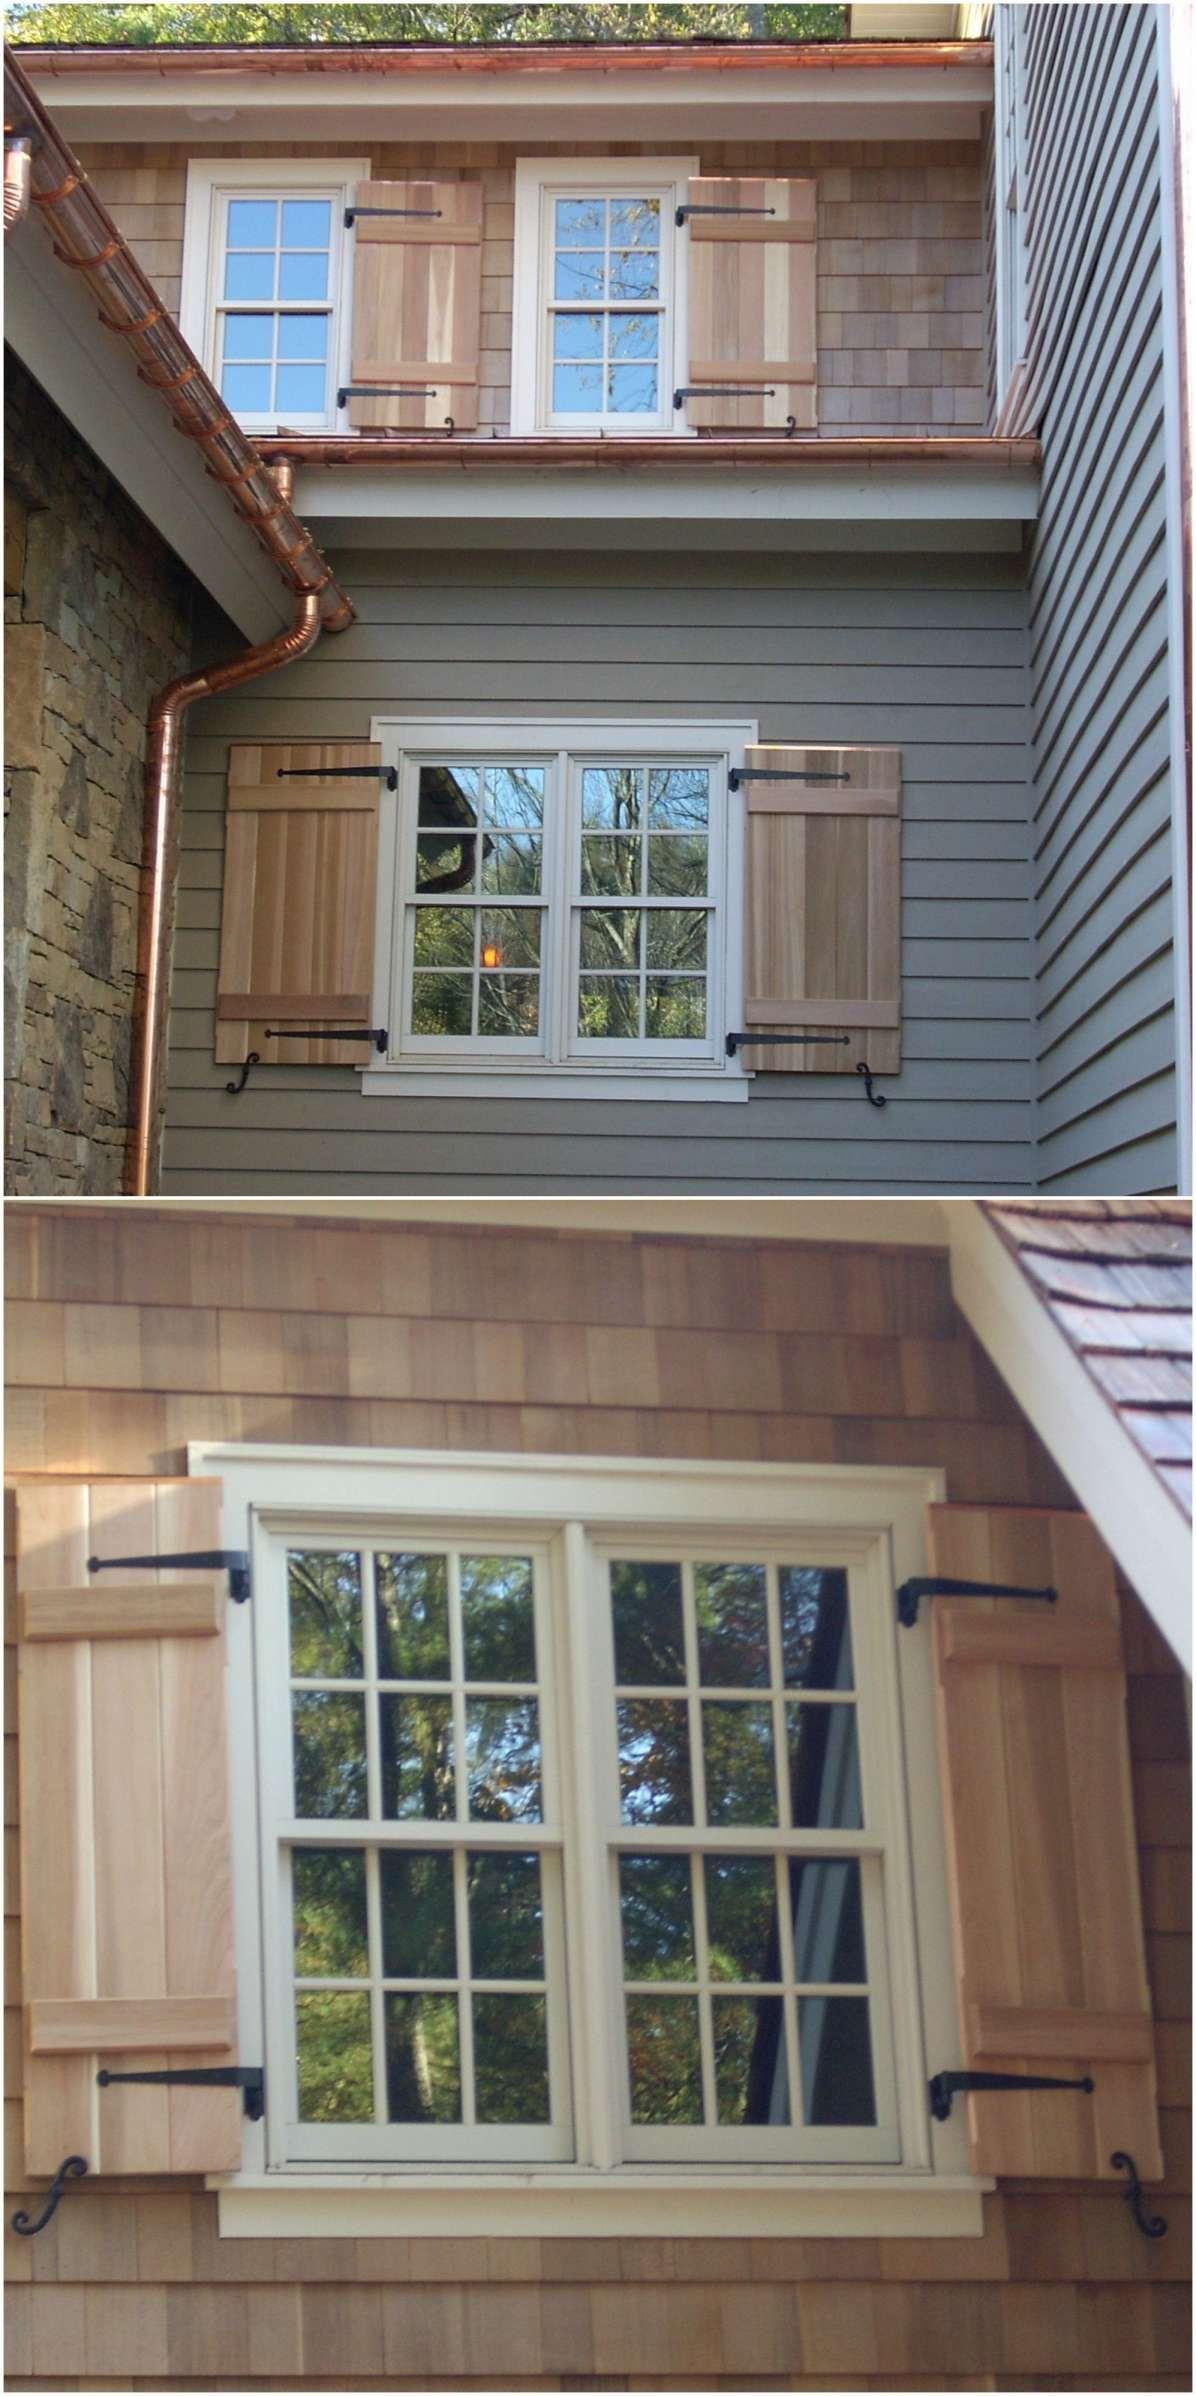 12 Wonderful Wooden Shutters Outdoor Photos Wooden Shutters Outdoor Shutters Shutters Exterior